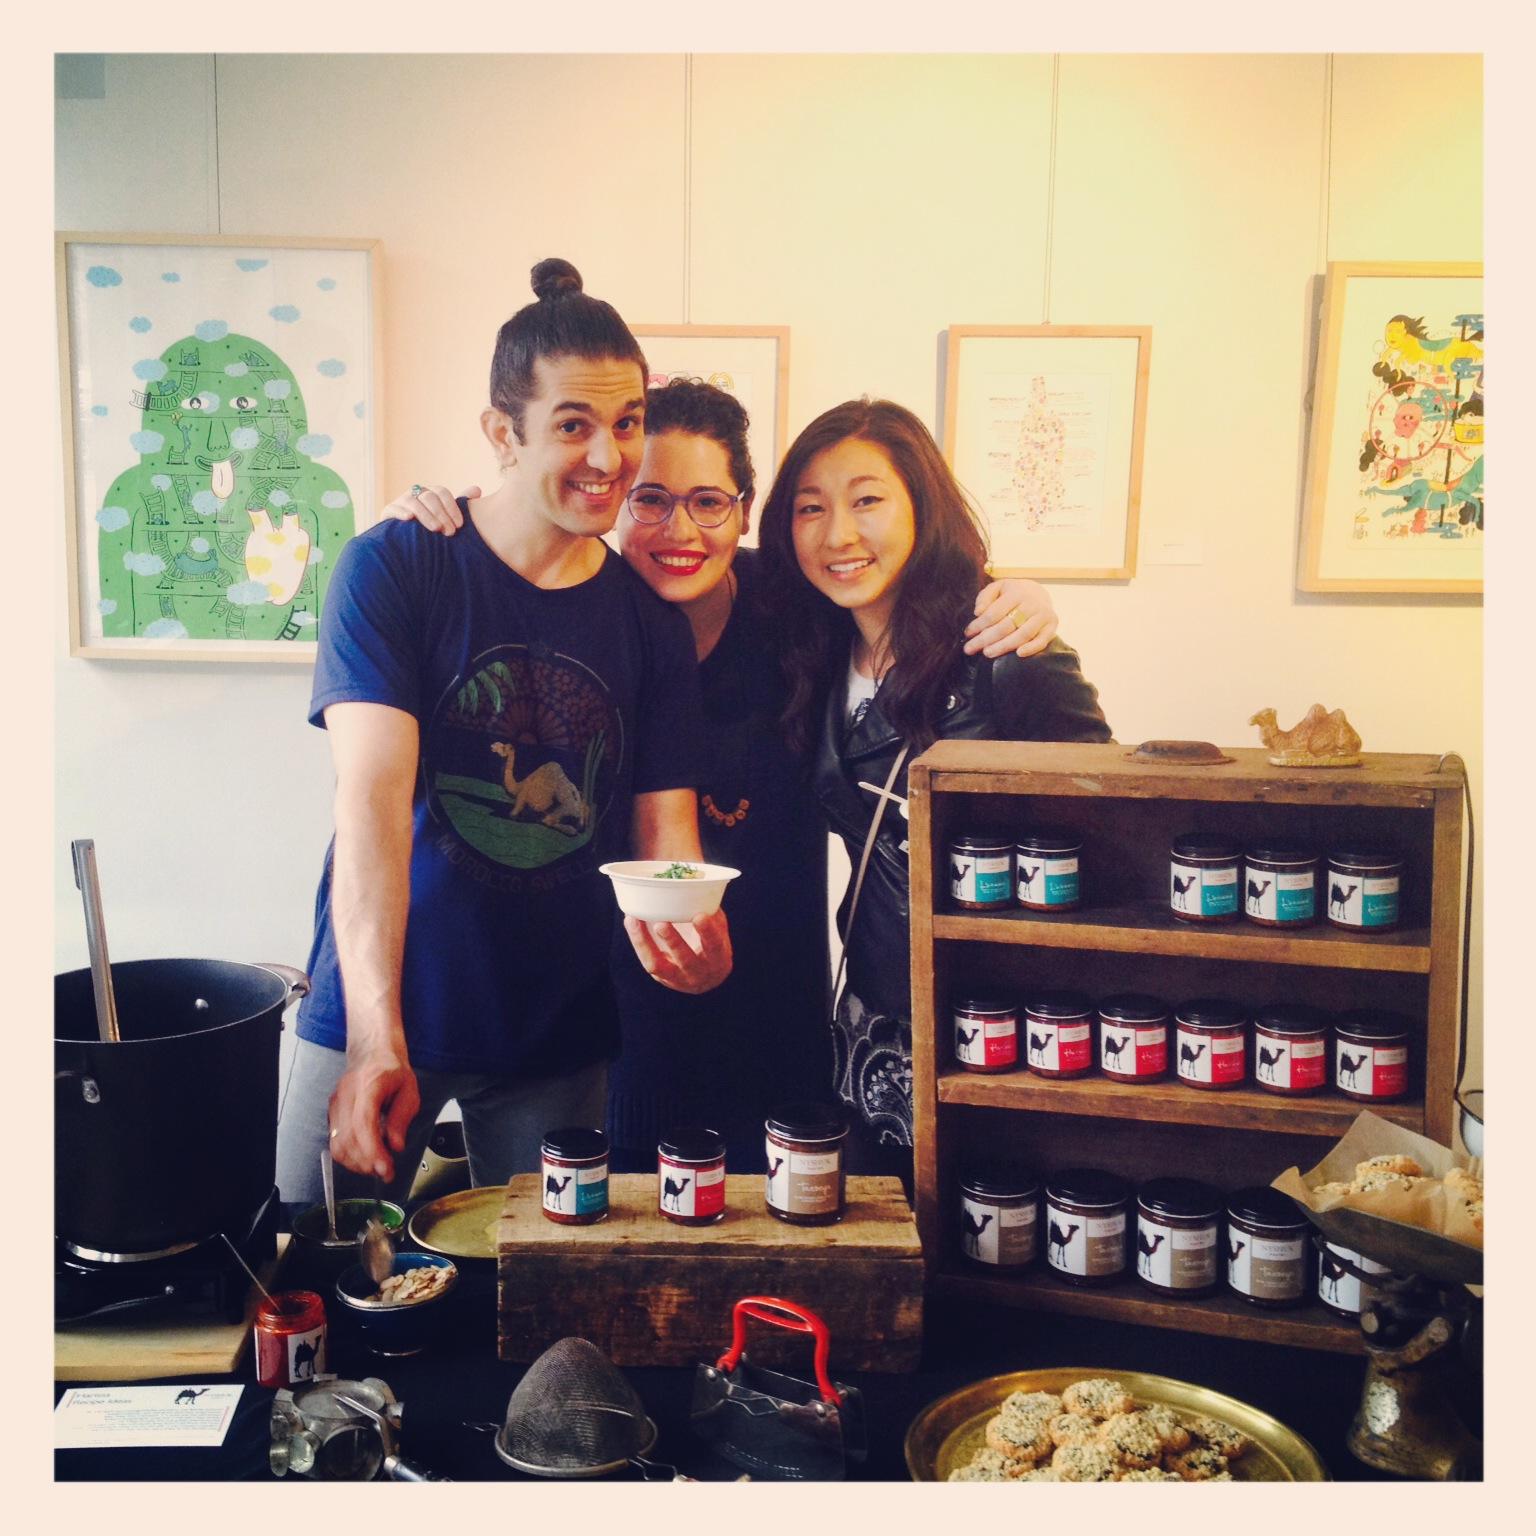 LA- BOITE spice shop, NYC Pop-Up, 2014